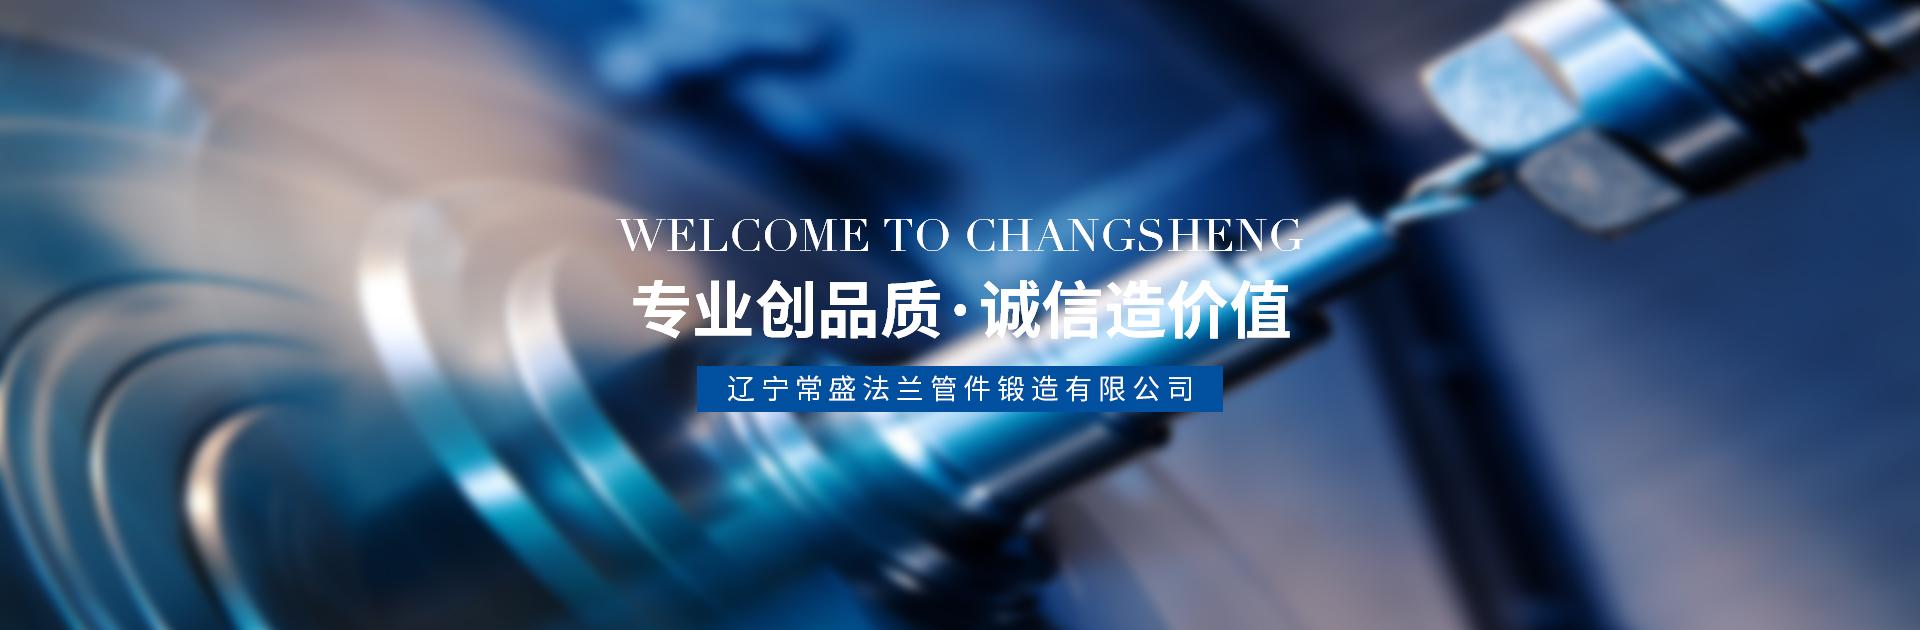 http://www.lncsfl.cn/data/upload/202012/20201225094906_612.jpg